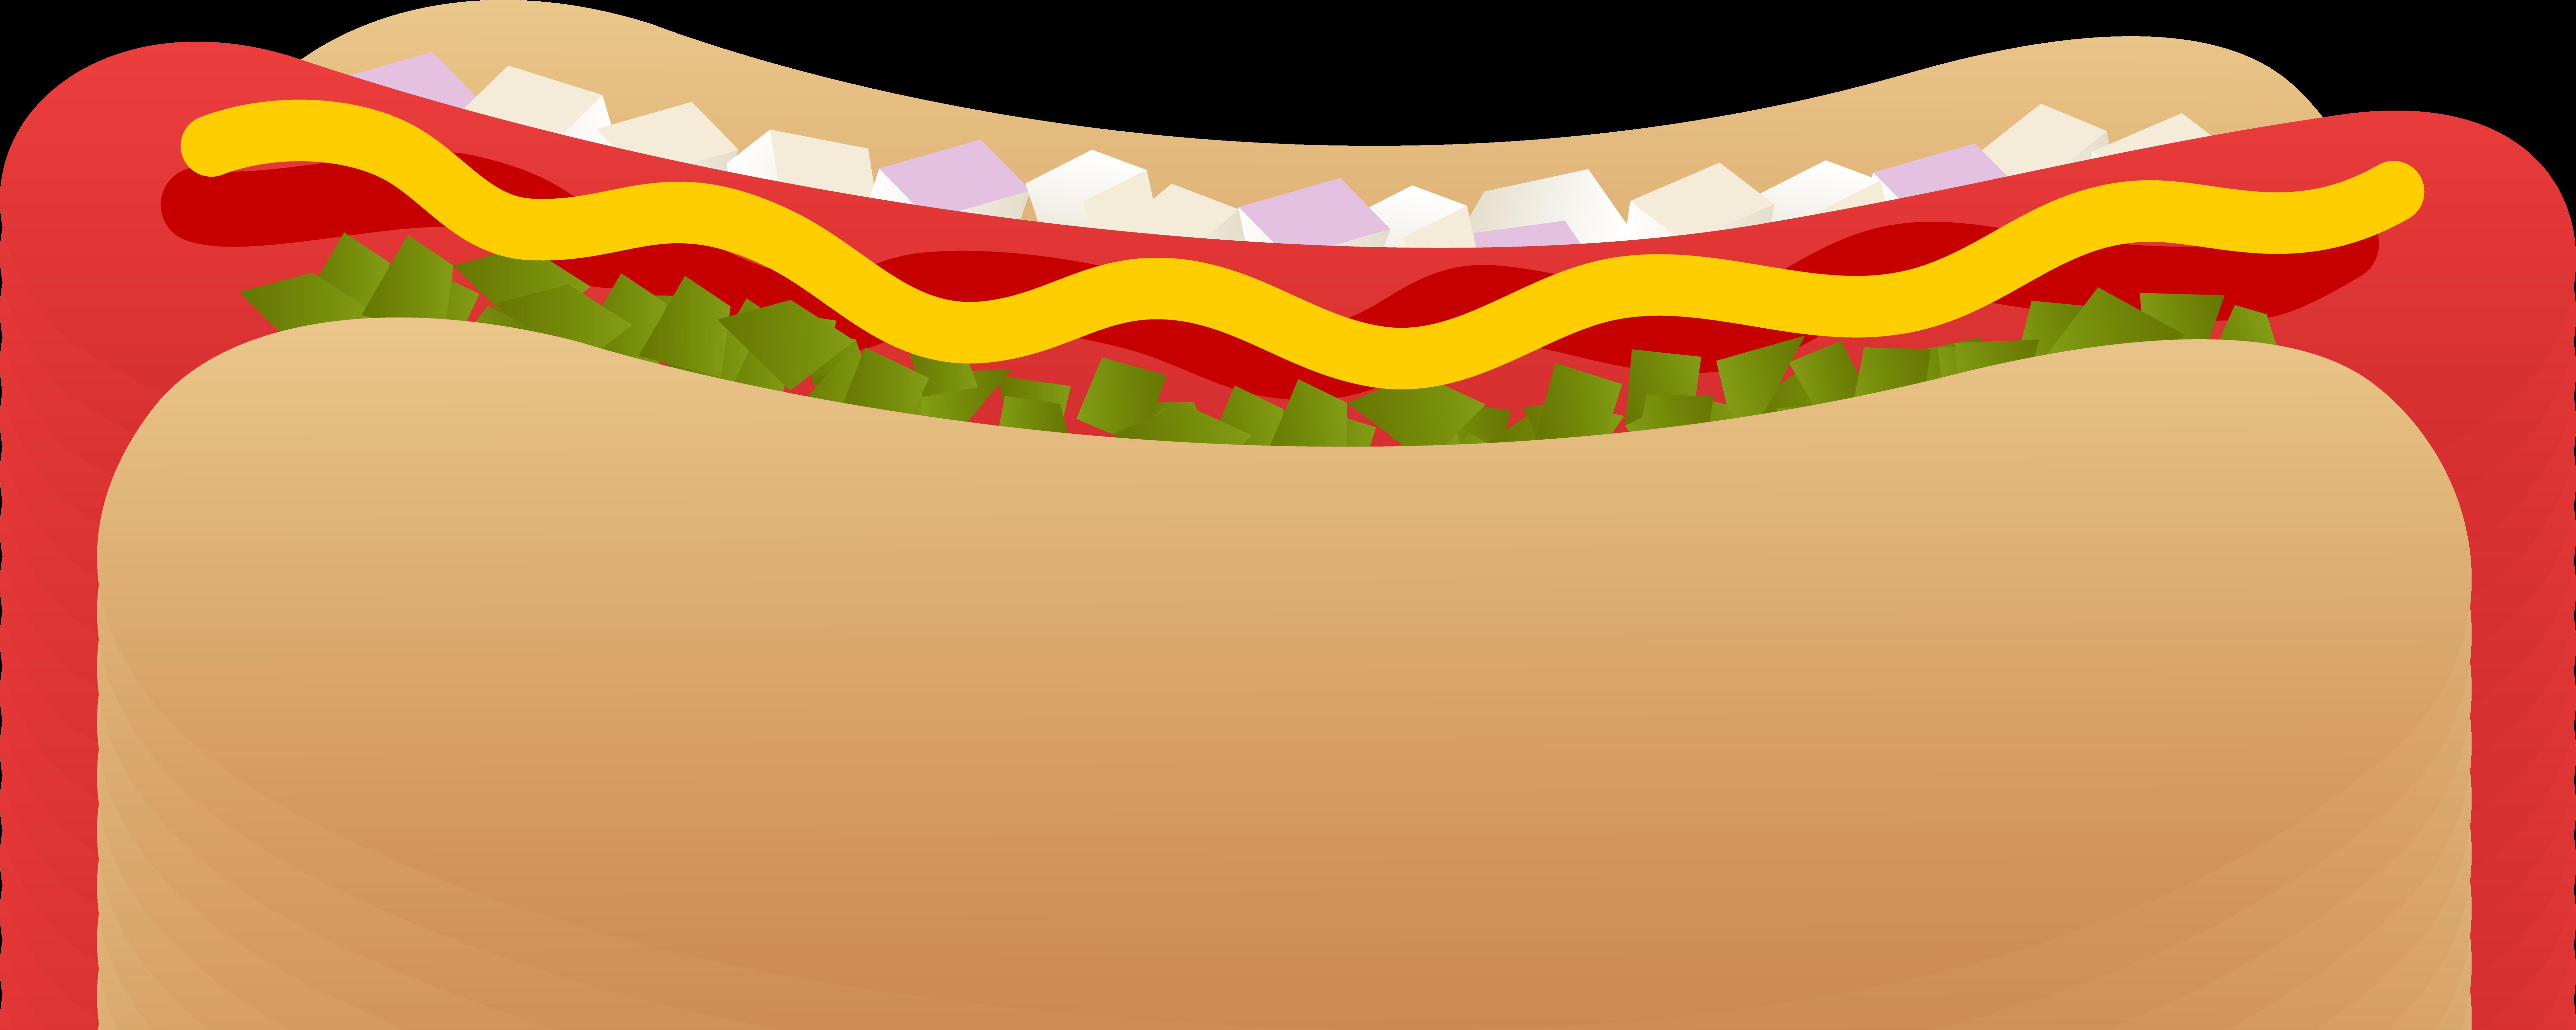 corrosion clipart u0026middot; hotdog cl-corrosion clipart u0026middot; hotdog clipart-0